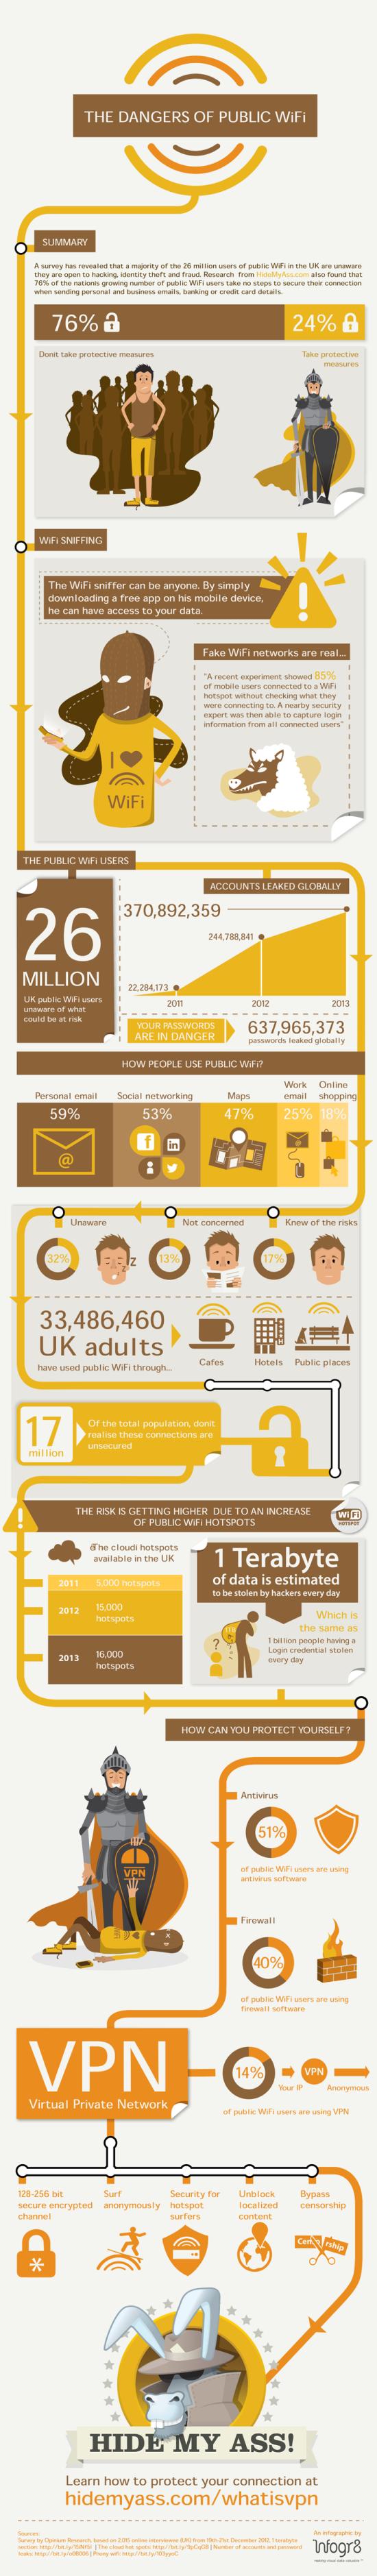 Nebezpeci verejneho wifi pripojeni - infografika